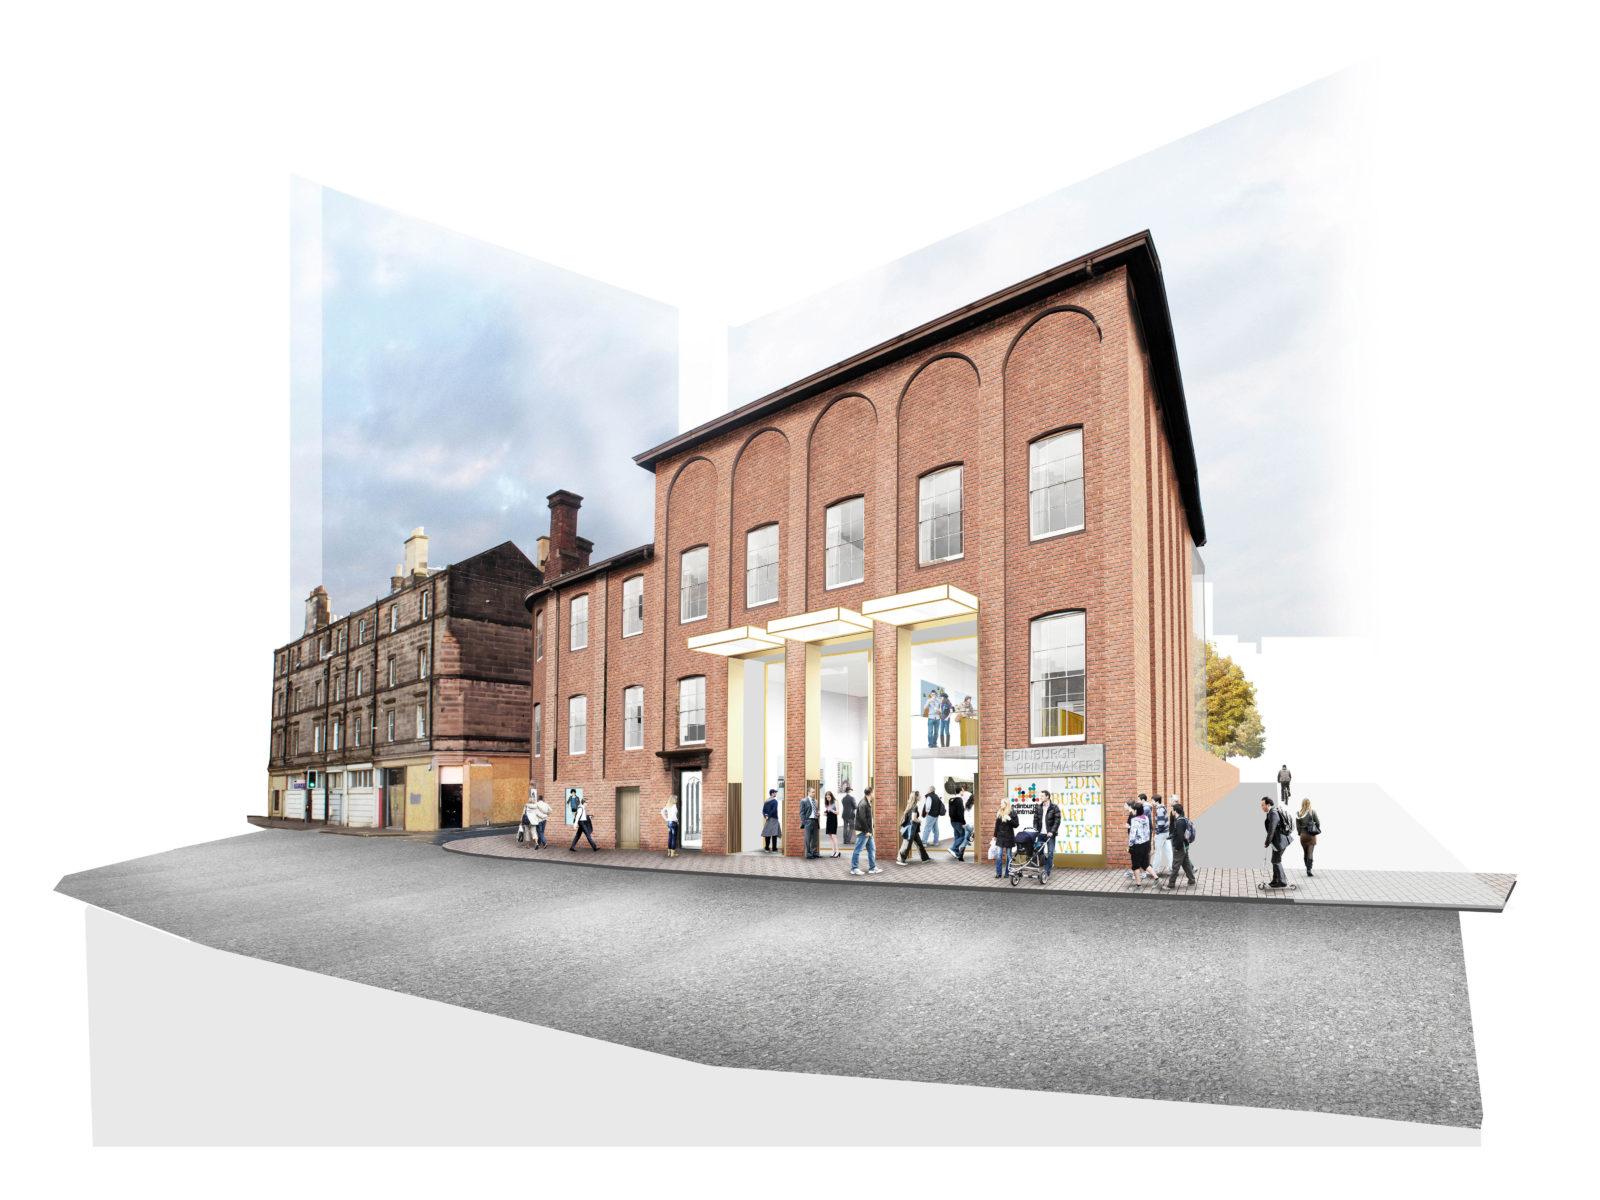 Edinburgh Printmakers, Castle Mill Works Redevelopment